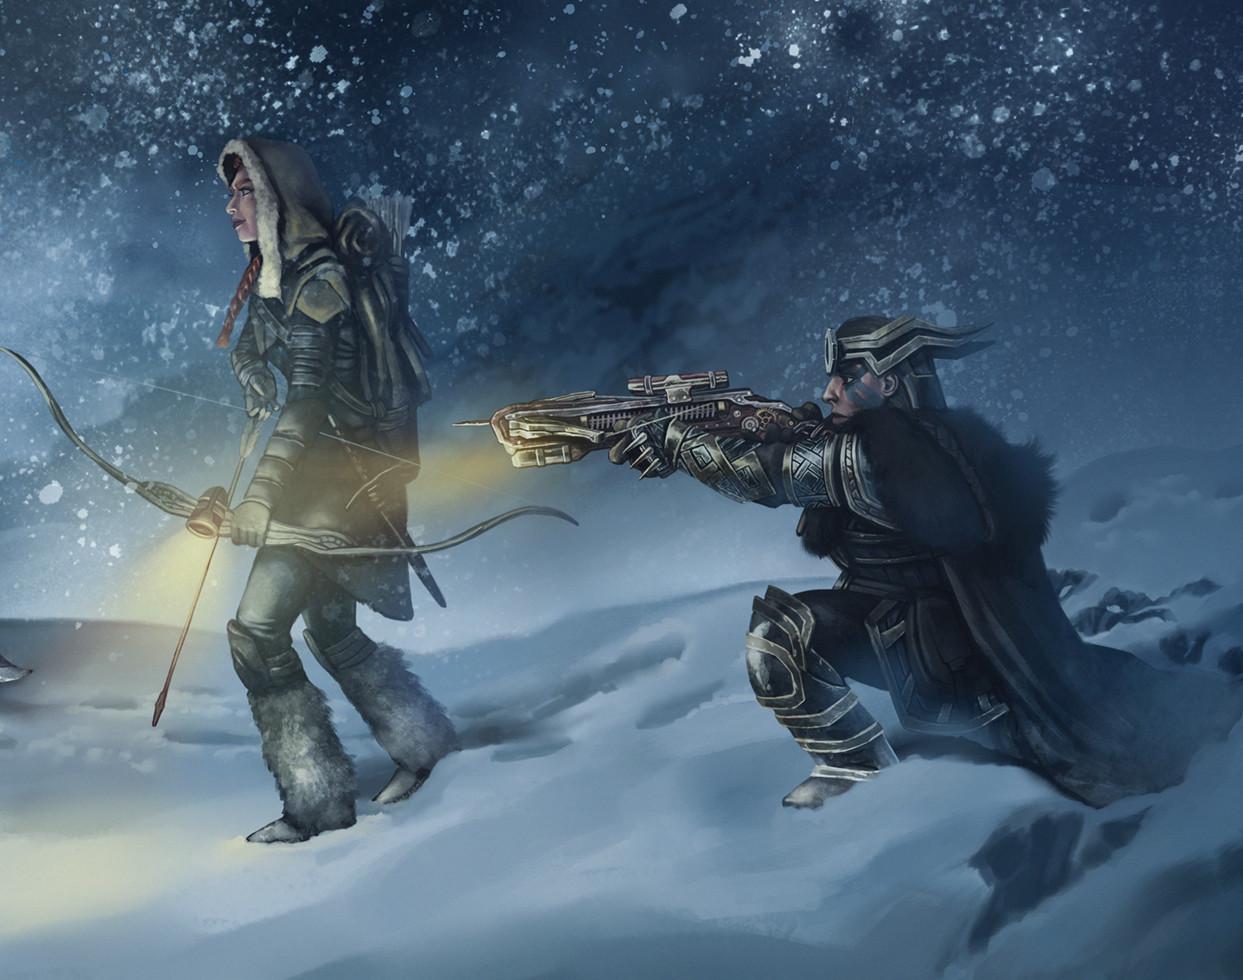 Dan ramos winter escudo det 03